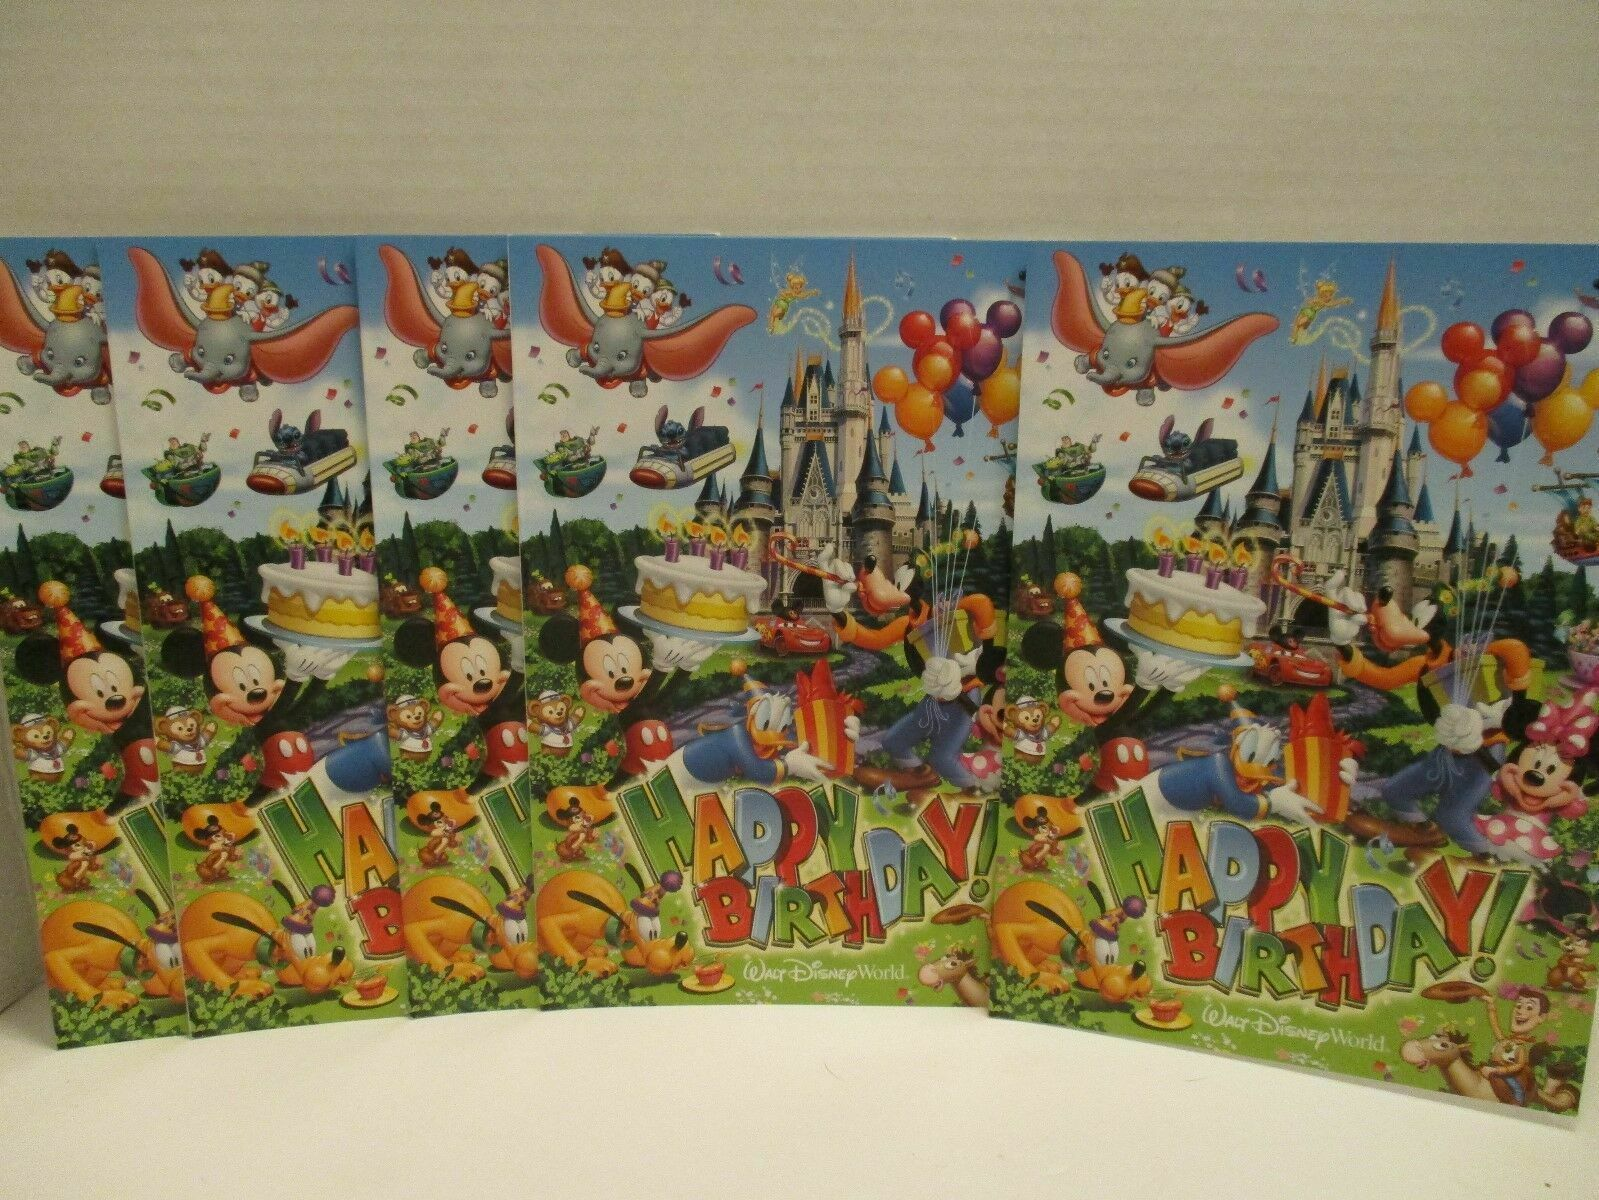 Walt Disney World Magic Kingdom Birthday Card Castle Lot of 5 Mickey Blank New - $9.89